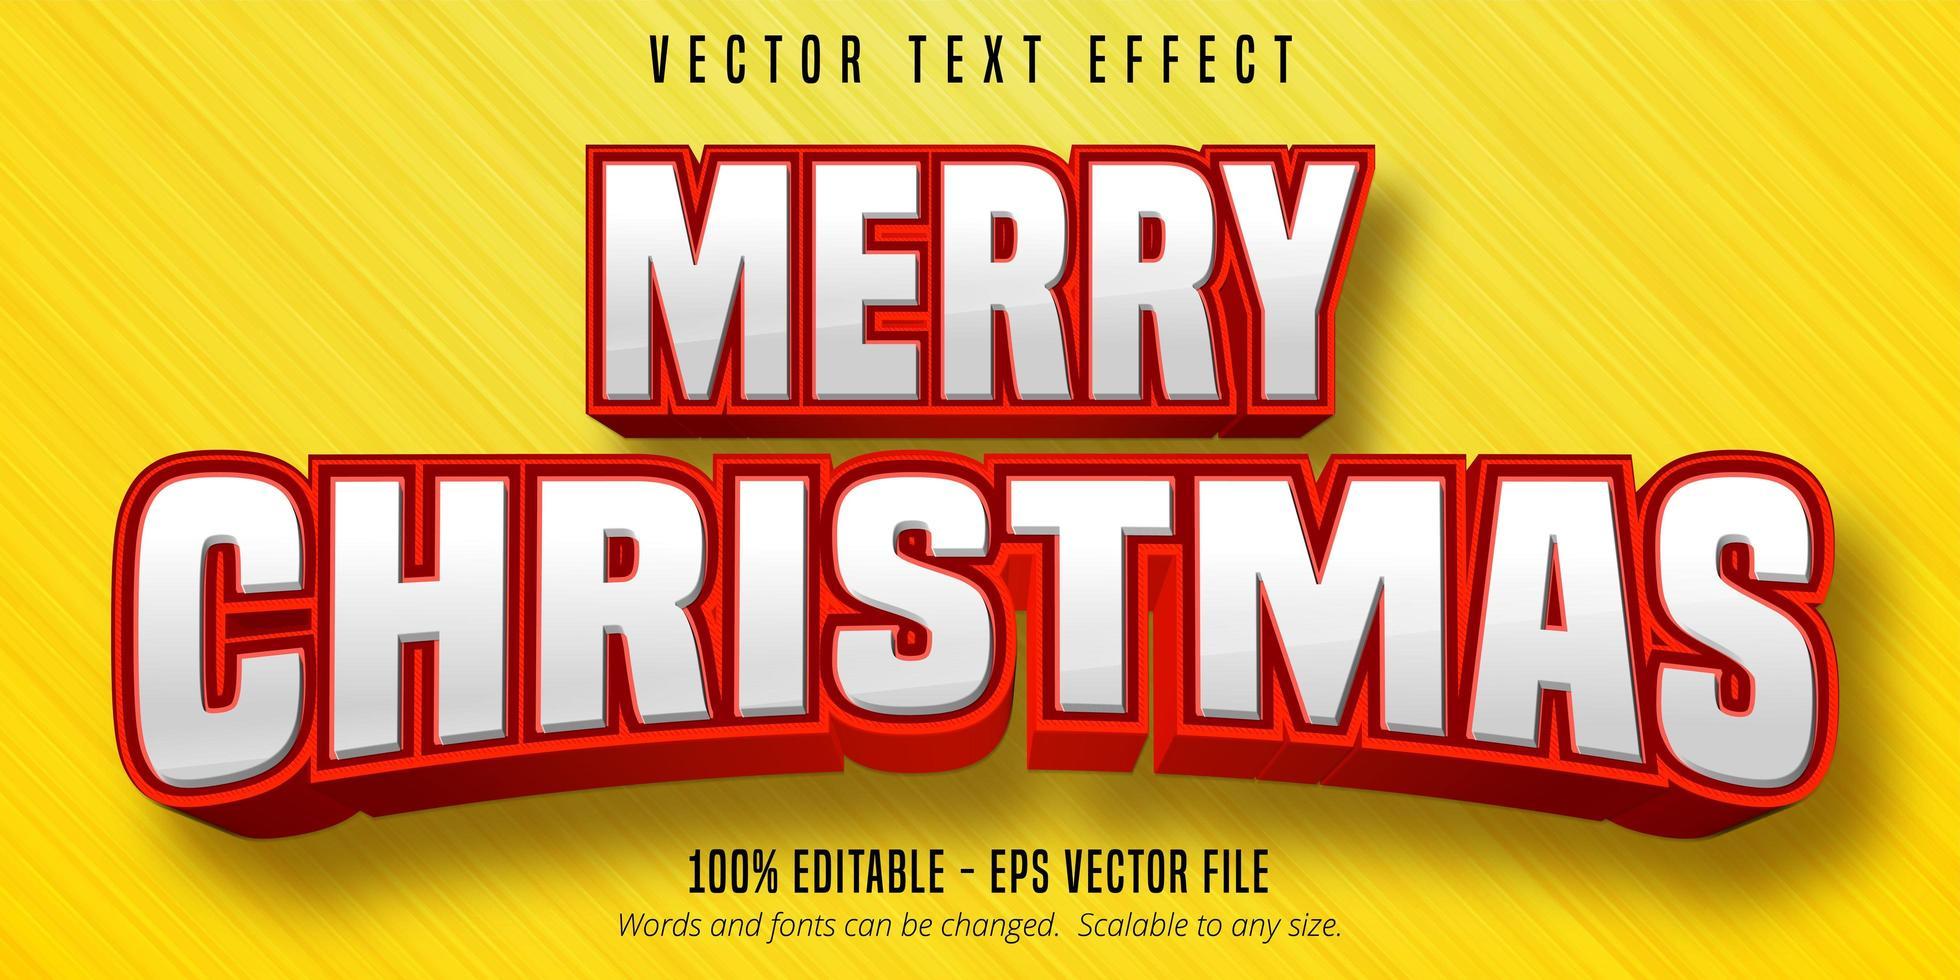 texto de feliz navidad, efecto de texto editable de estilo navideño vector